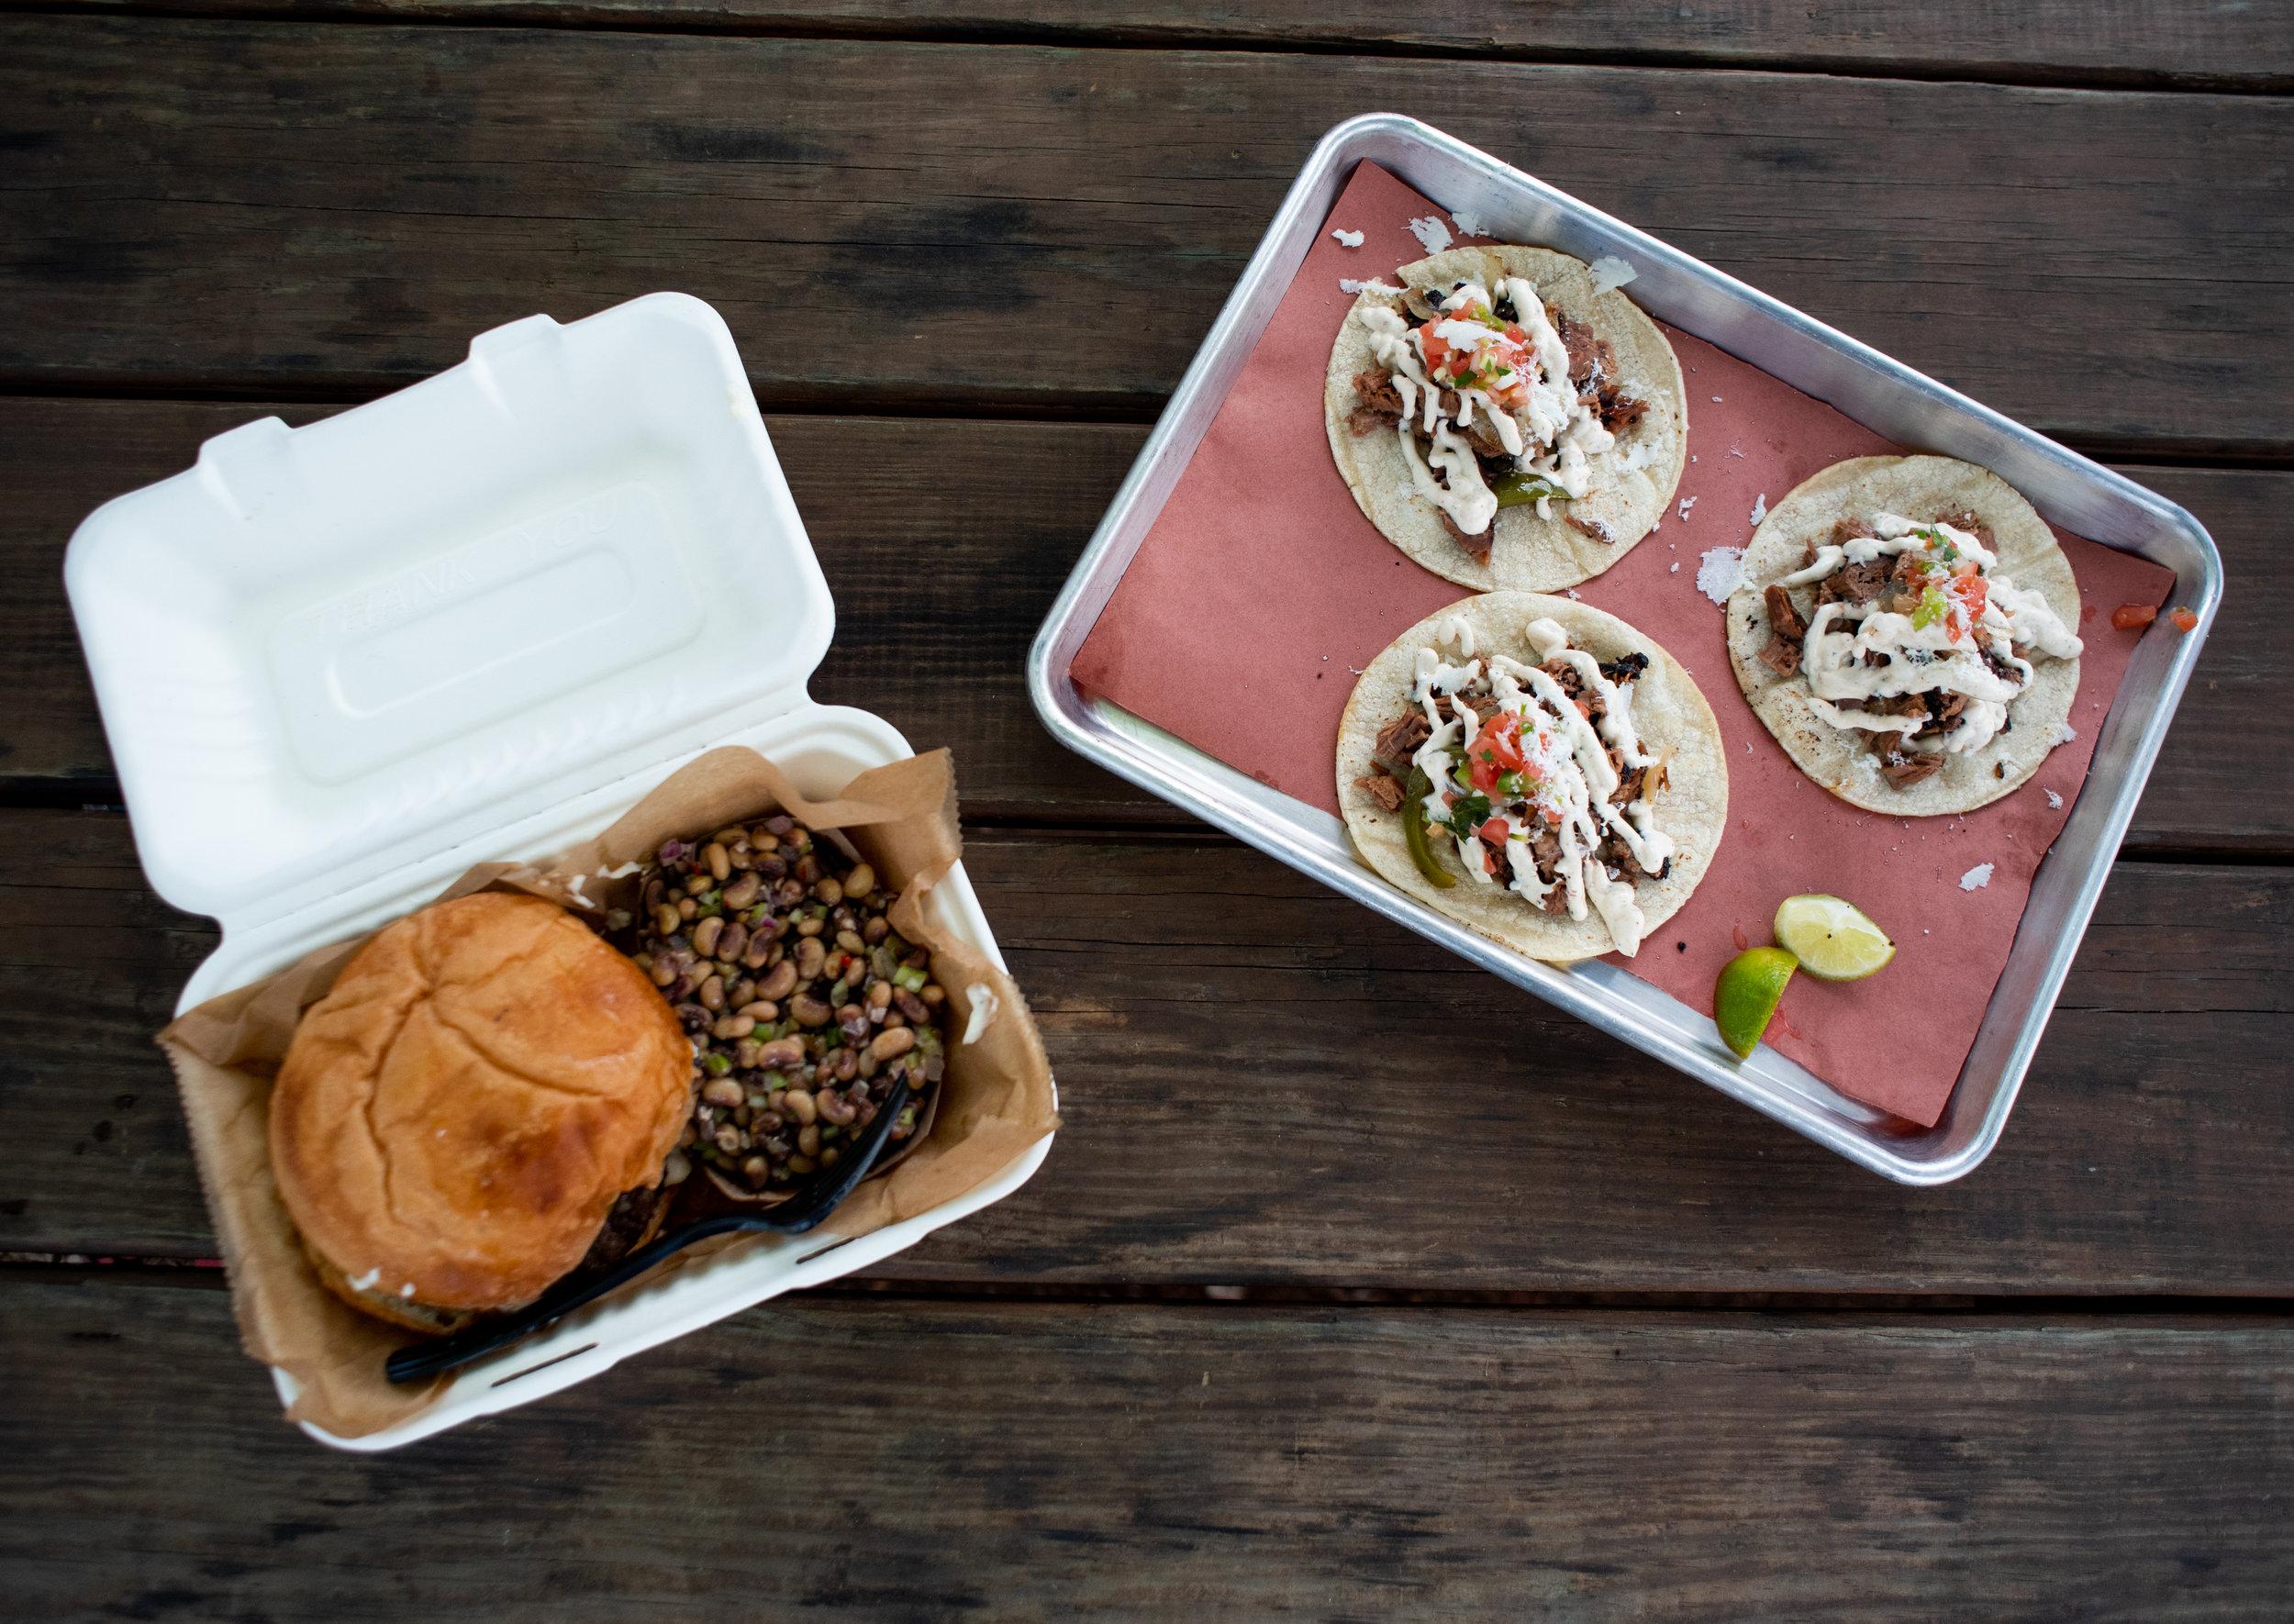 Habanero burger and BBQ brisket tacos